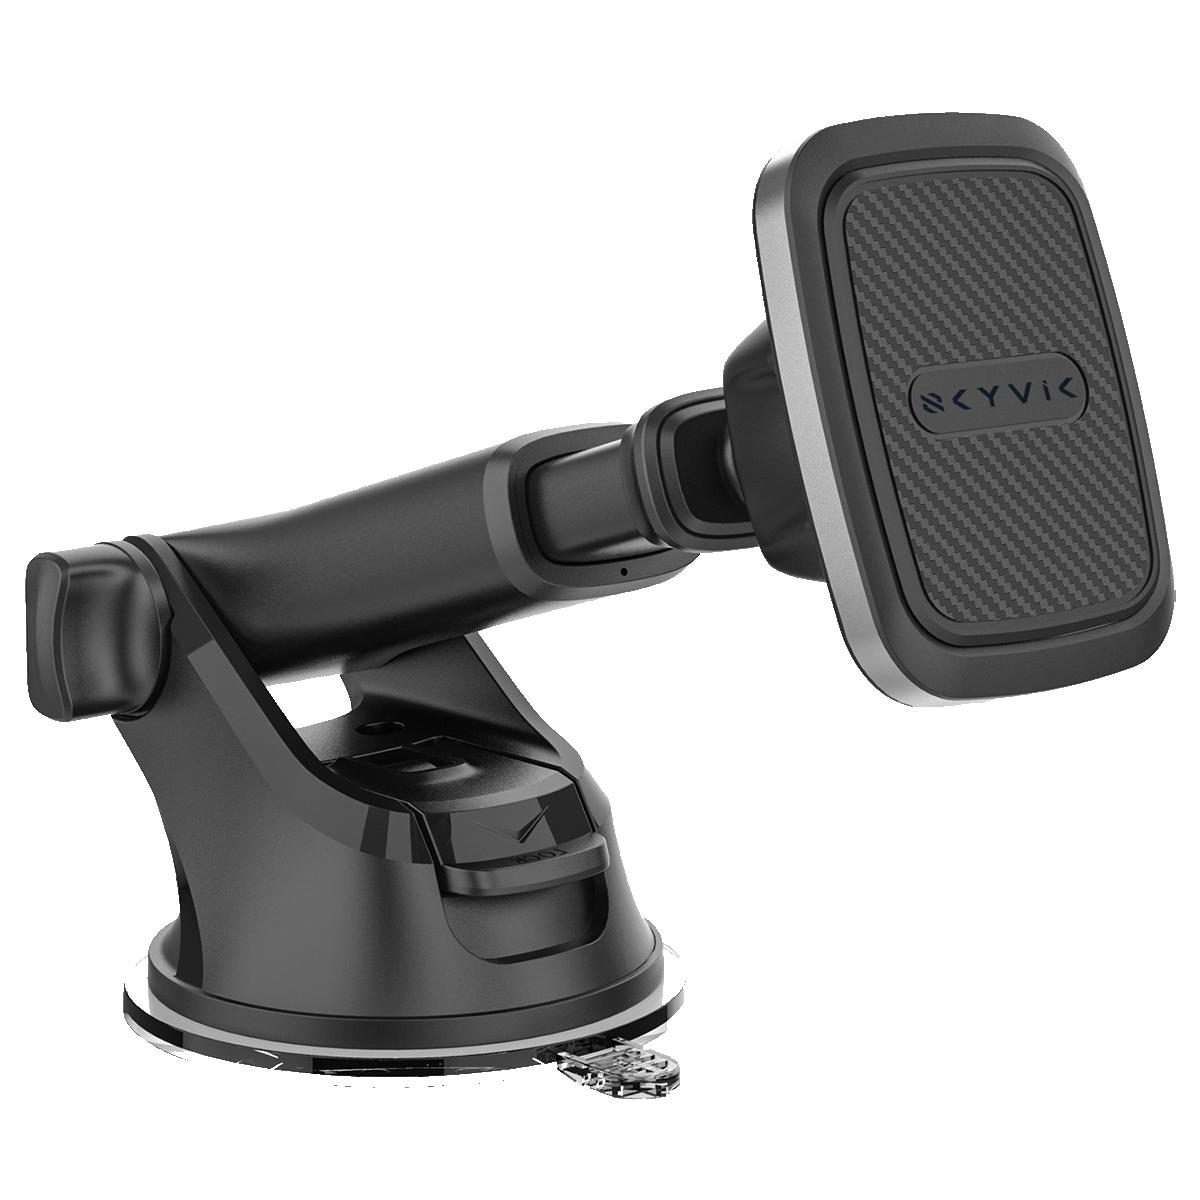 SkyVik Truhold Windshield Magnetic Mobile Holder (Car, CM-WM01, Black)_1